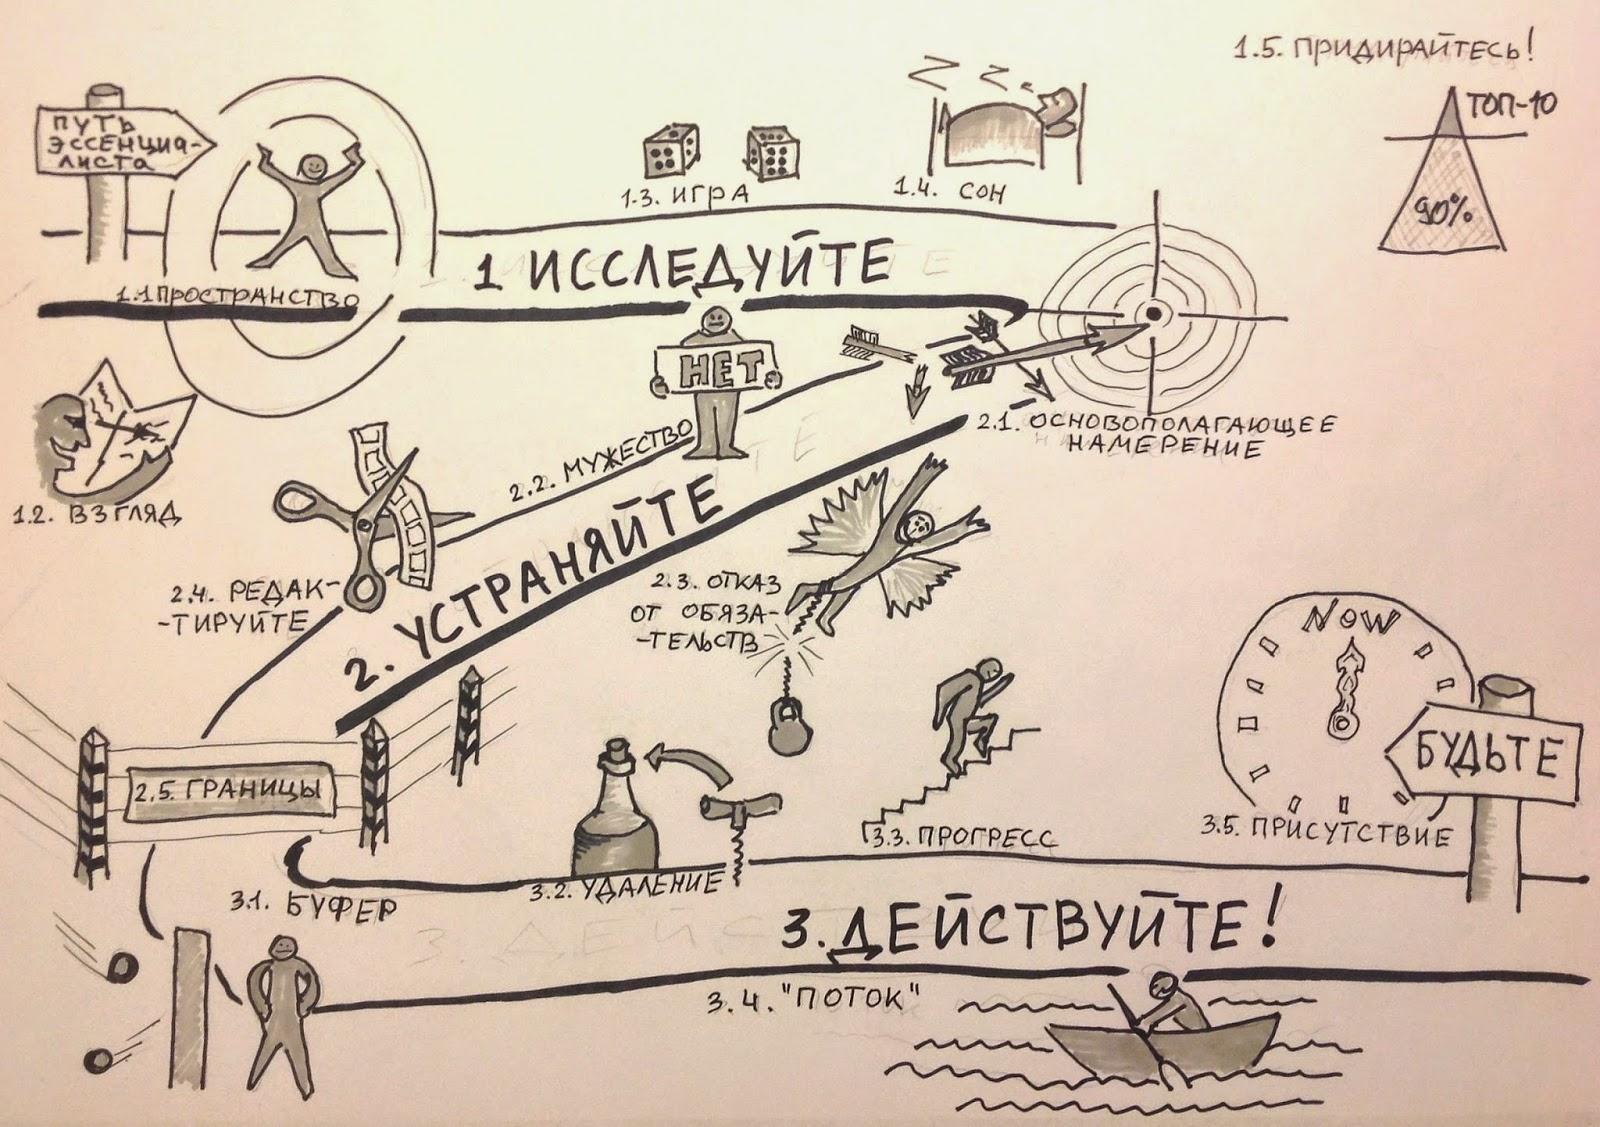 Путь эссенциалиста: три этапа и 15 техник саморазвития